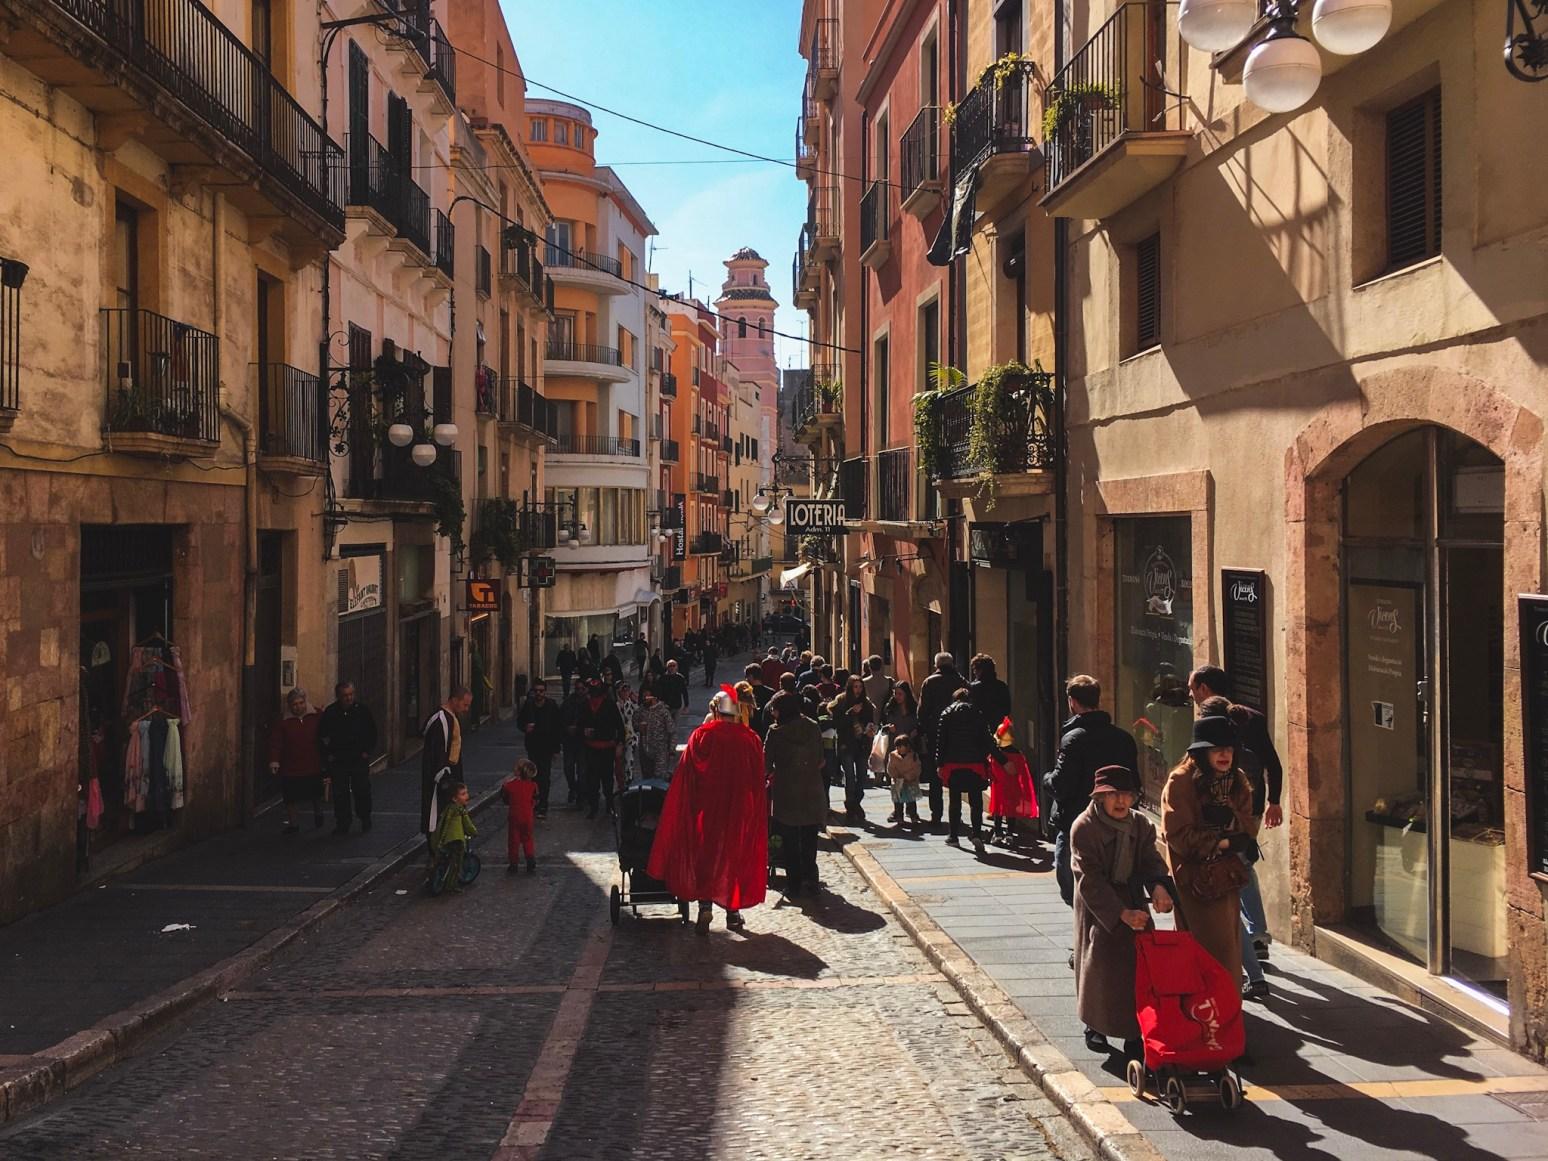 Day trip to Tarragona from Barcelona, Spain